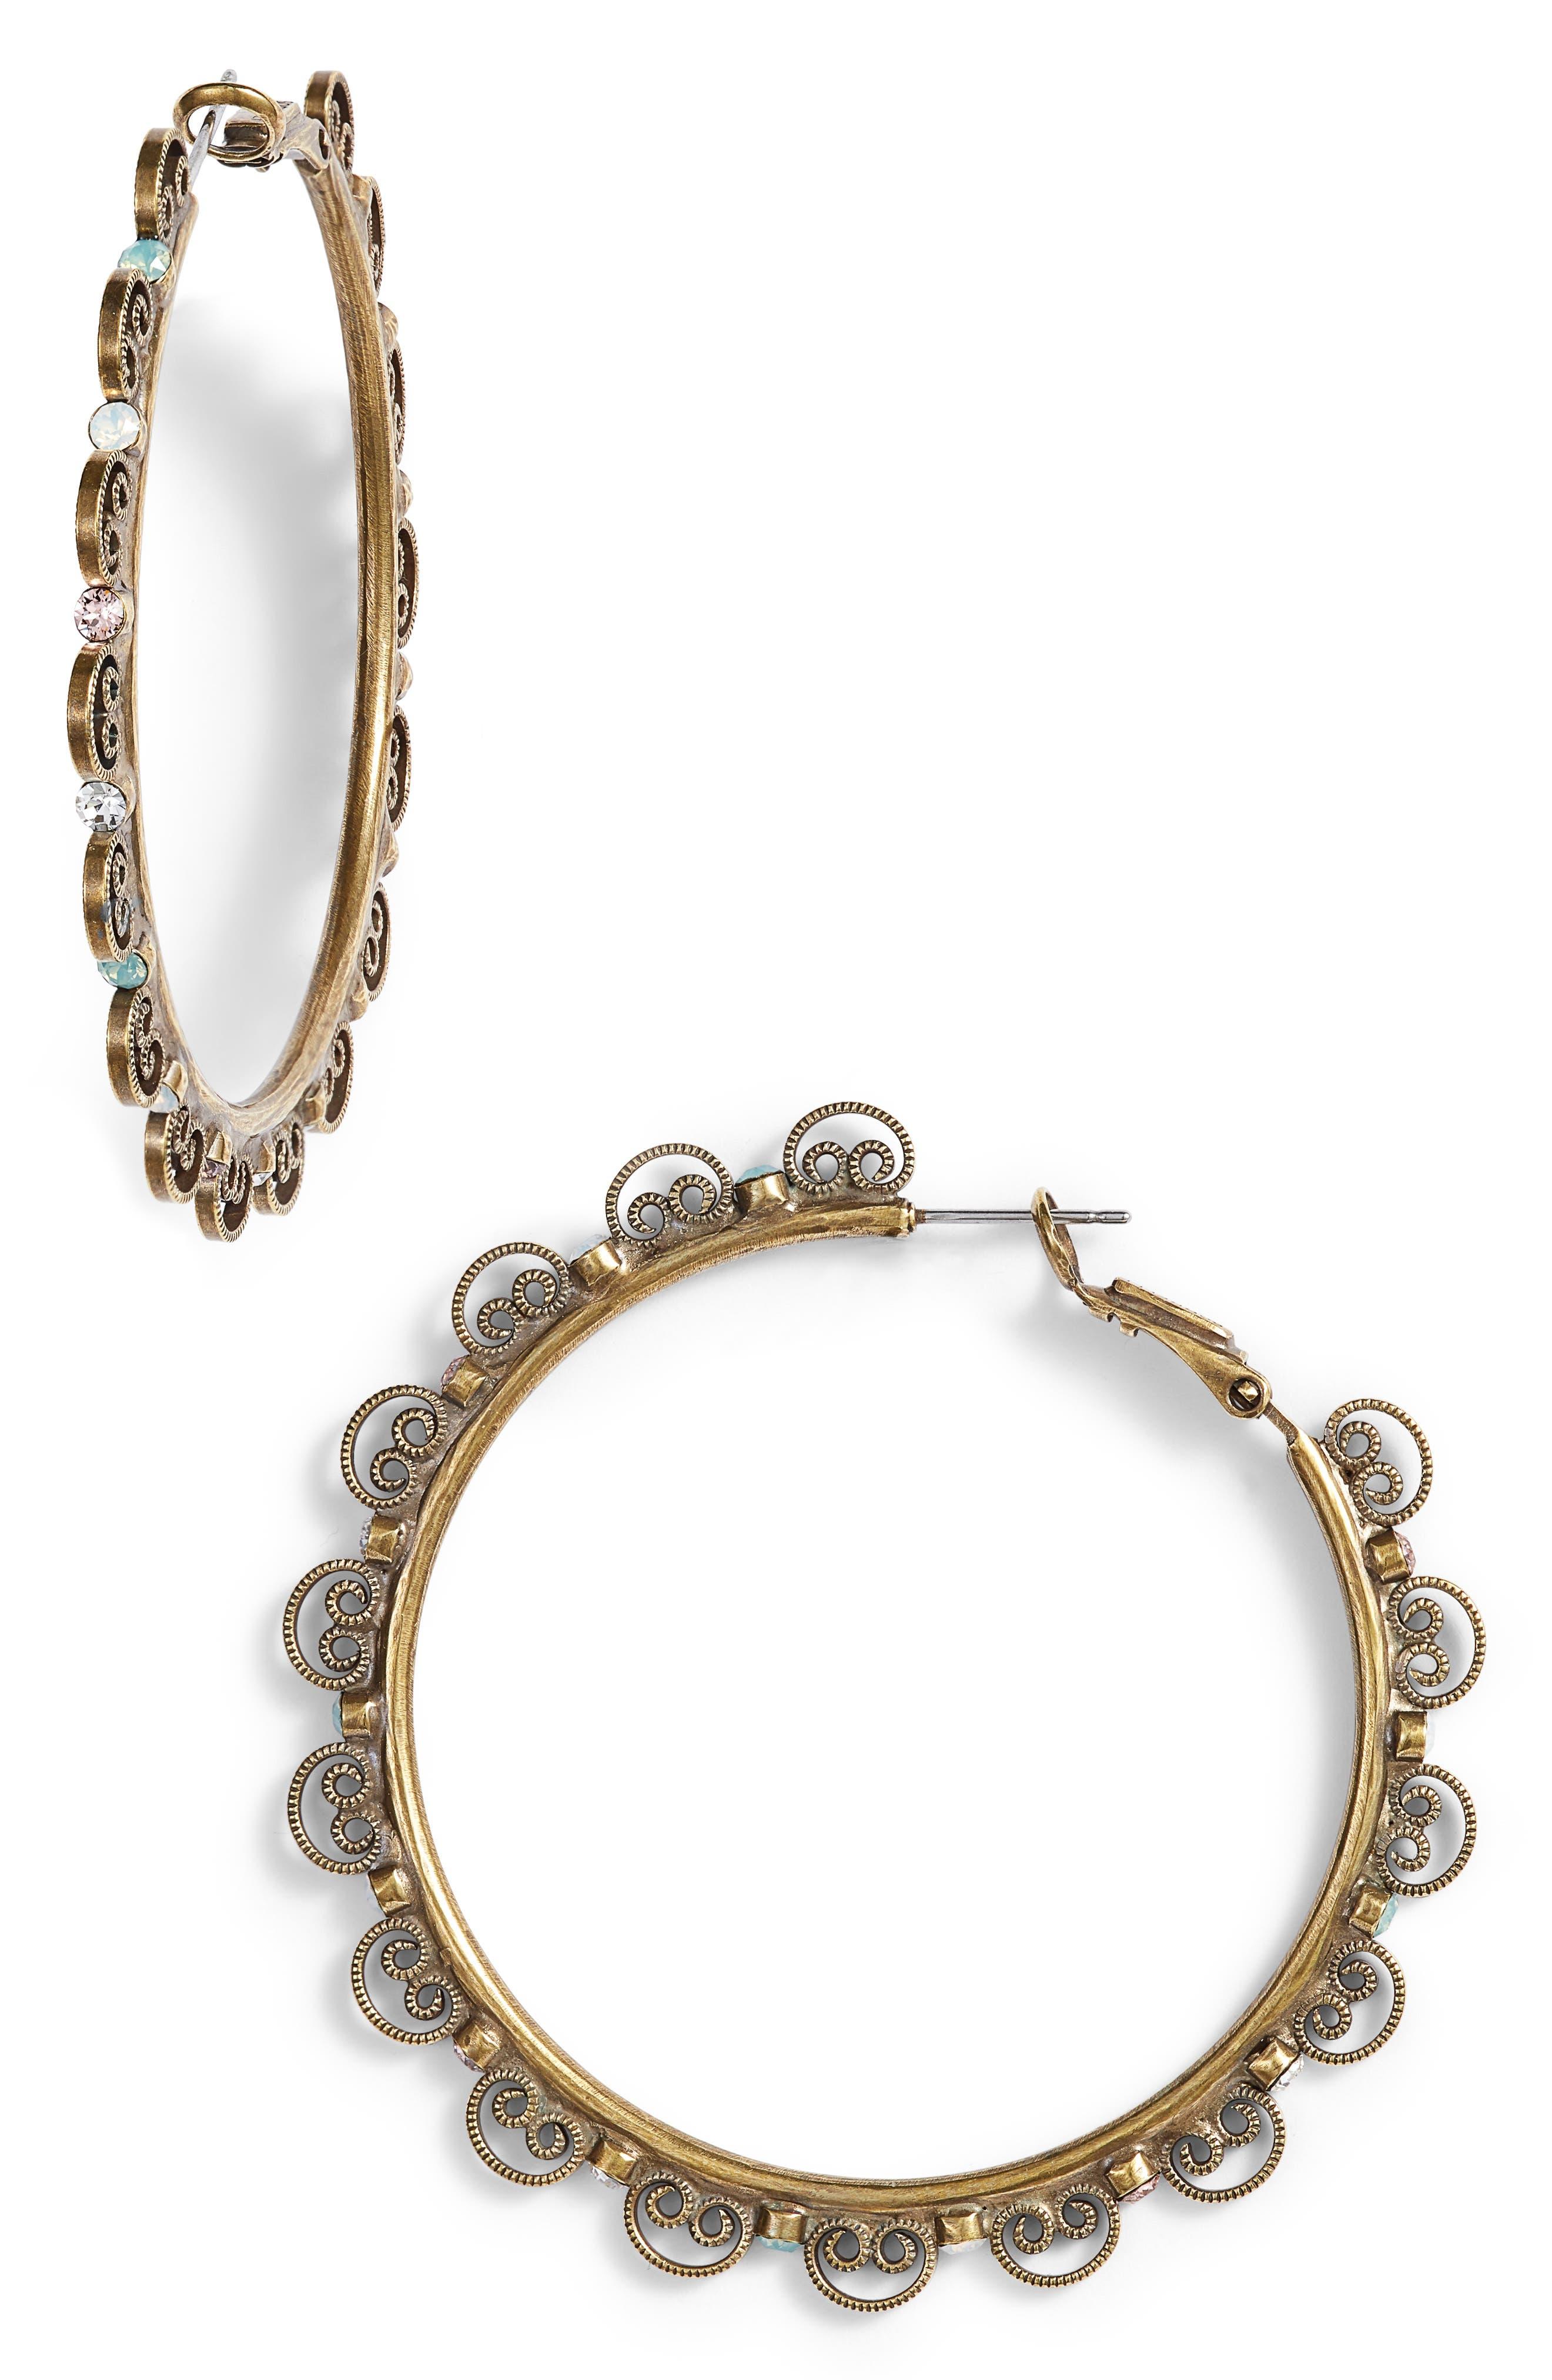 Foxglove Crystal Hoop Earrings,                             Main thumbnail 1, color,                             Gold